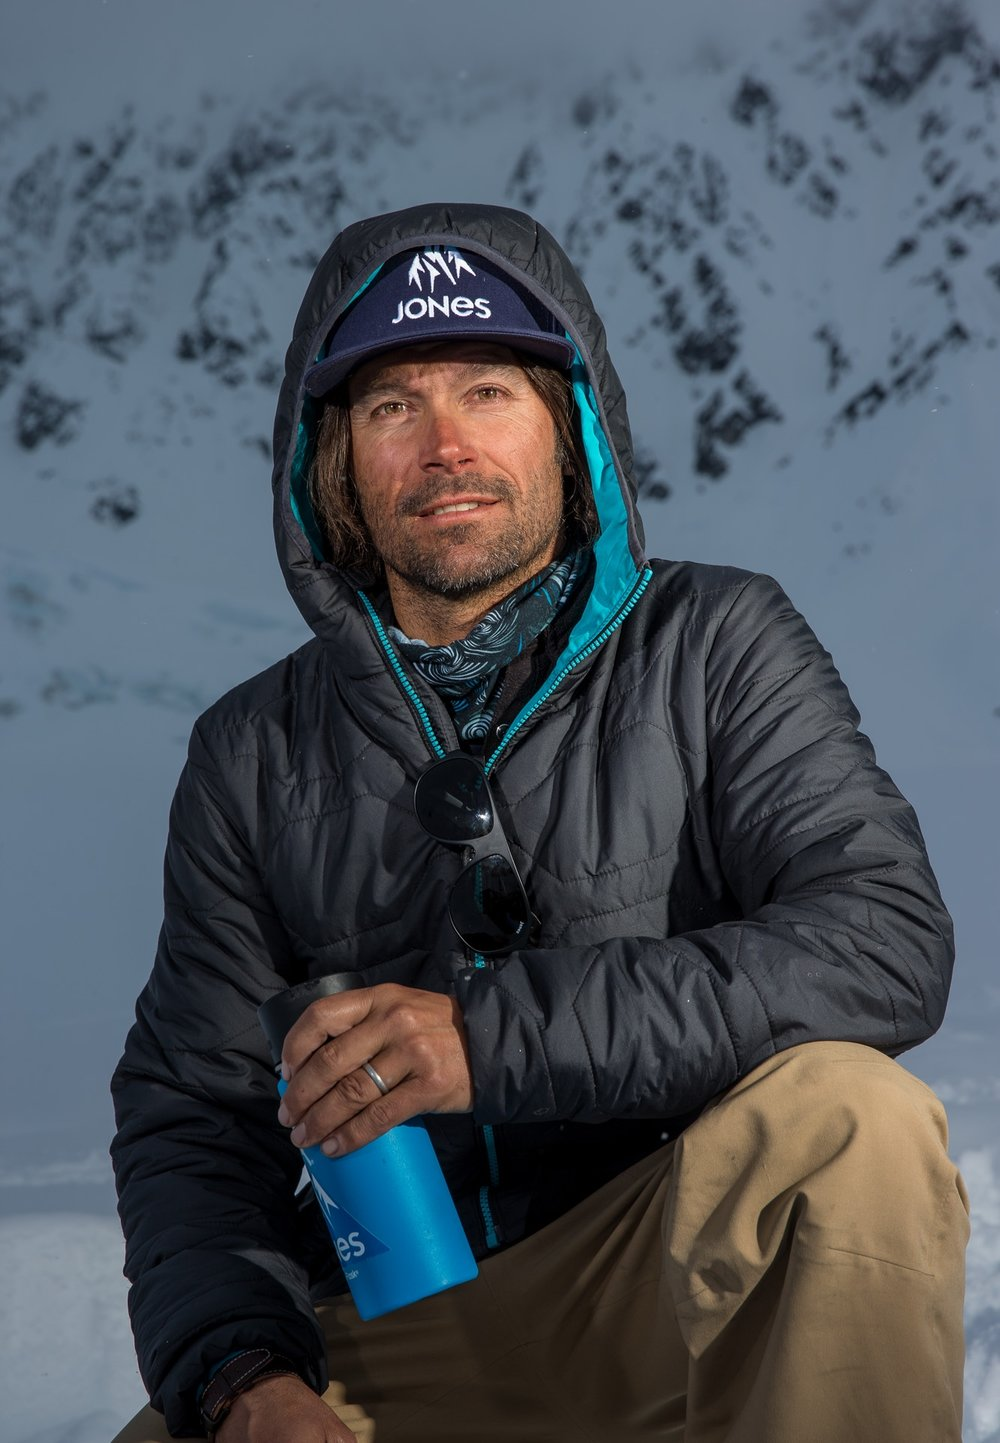 "<a href=""/jeremy-jones"">Jeremy Jones<strong>Professional Snowboarder & Environmentalist</strong></a>"